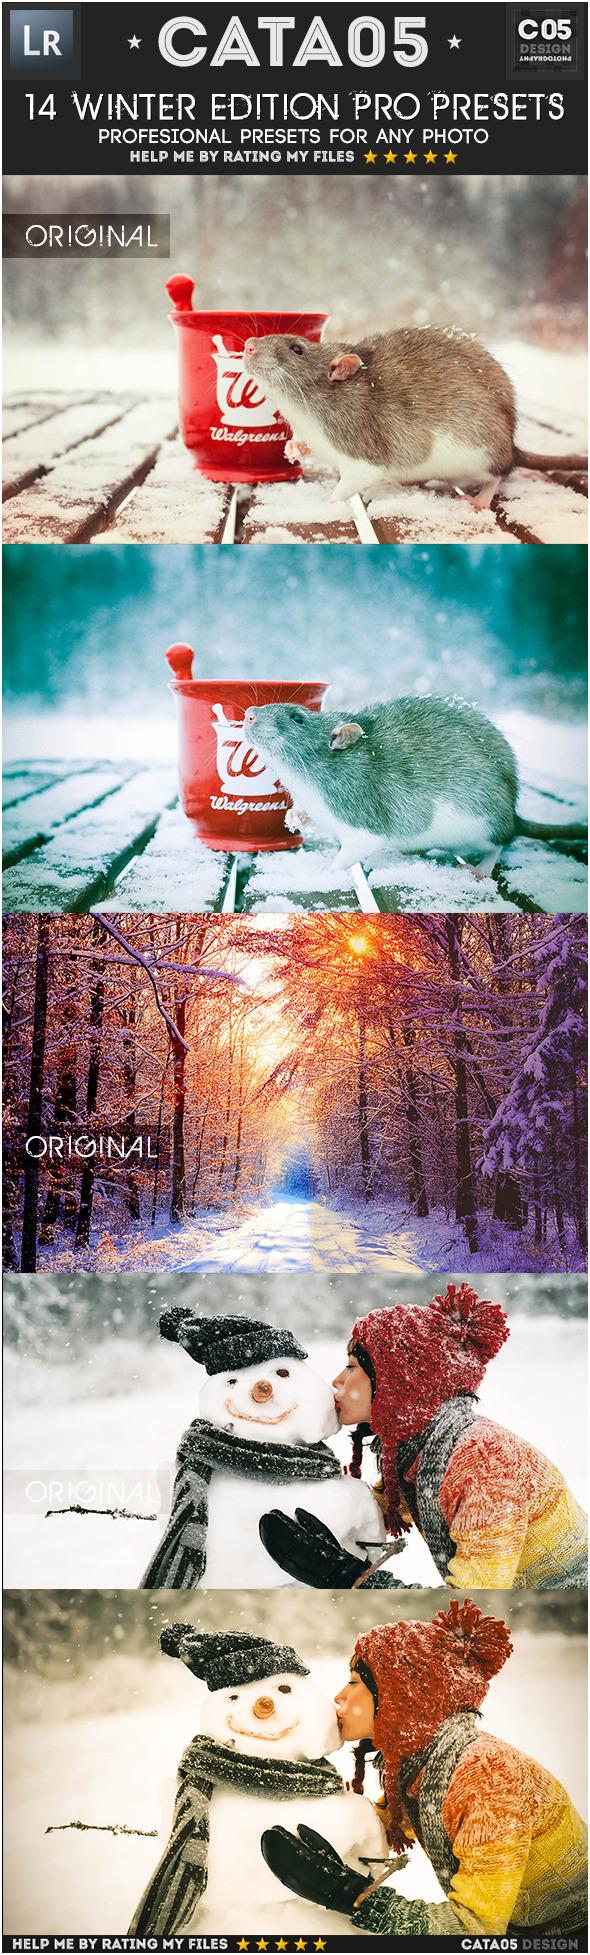 14 Winter Edition Pro Presets - Portrait Lightroom Presets